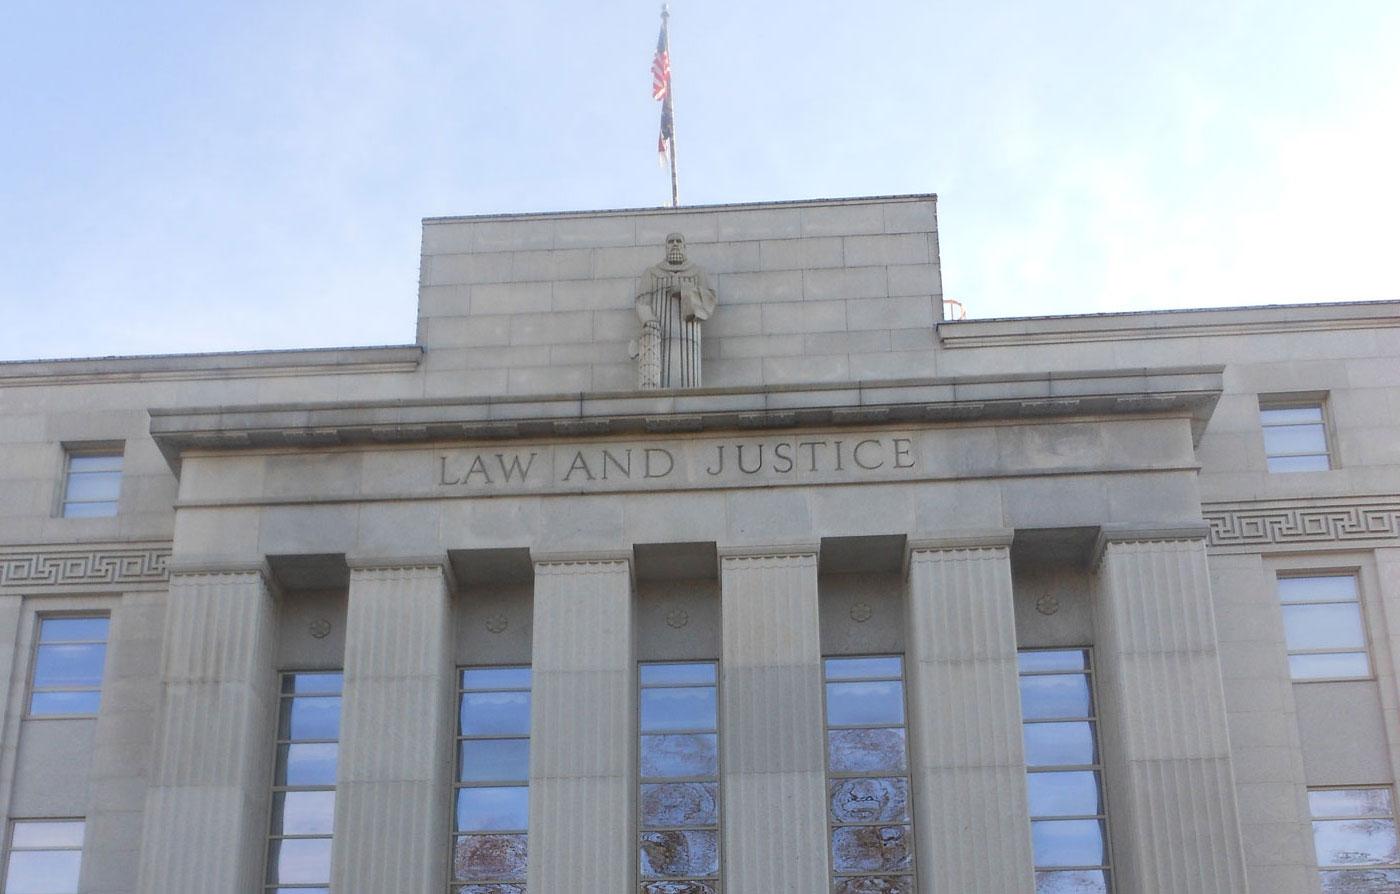 North-Carolina-Supreme-Court-building-in-Raleigh-CC-3.0